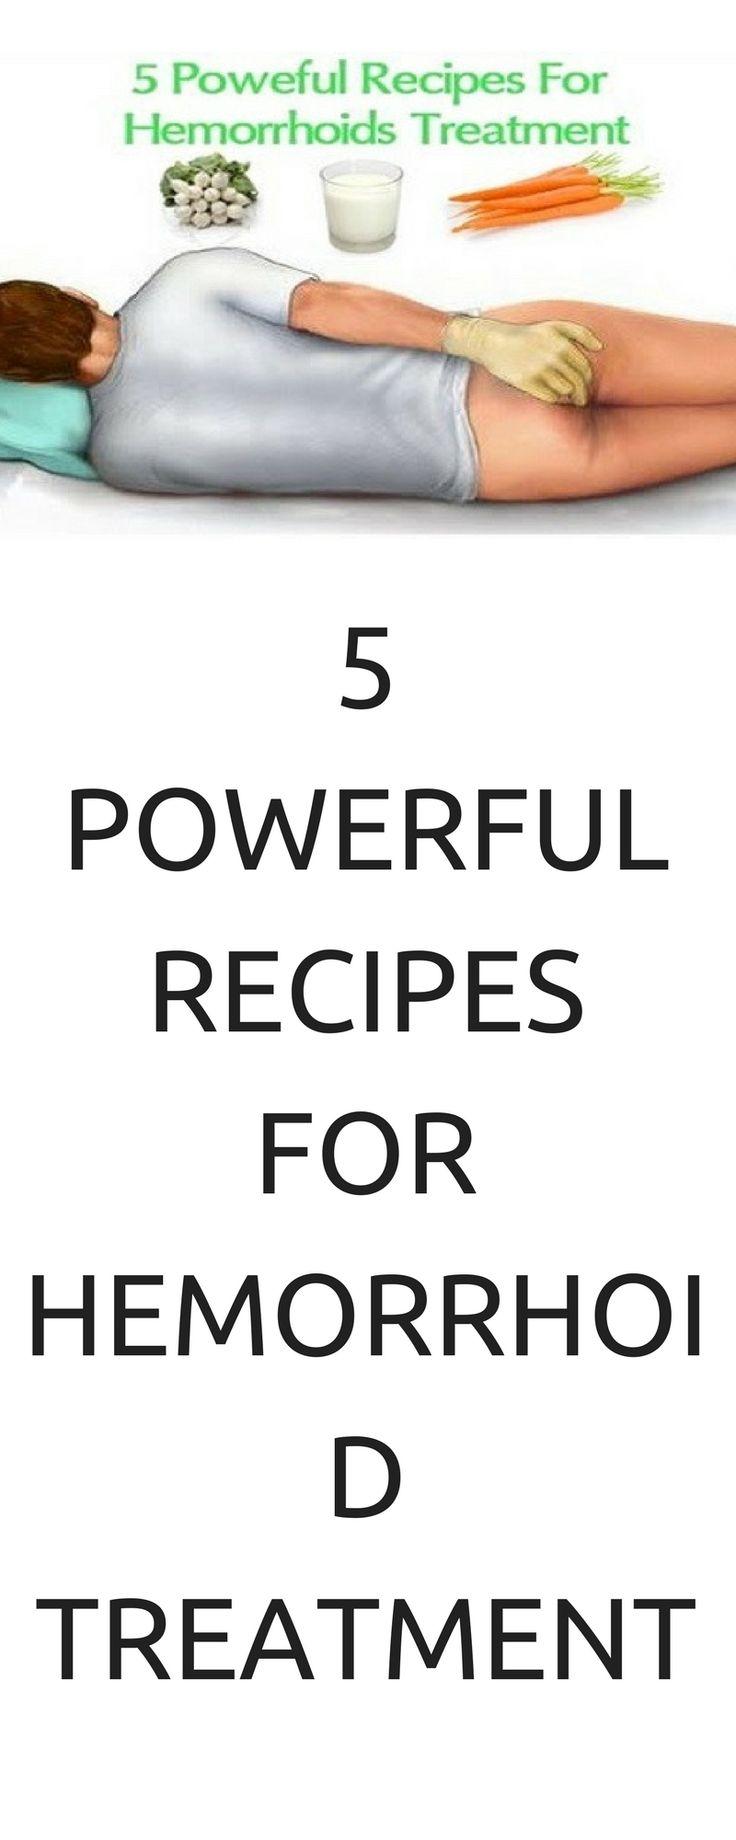 5 POWERFUL RECIPES FOR HEMORRHOID TREATMENT